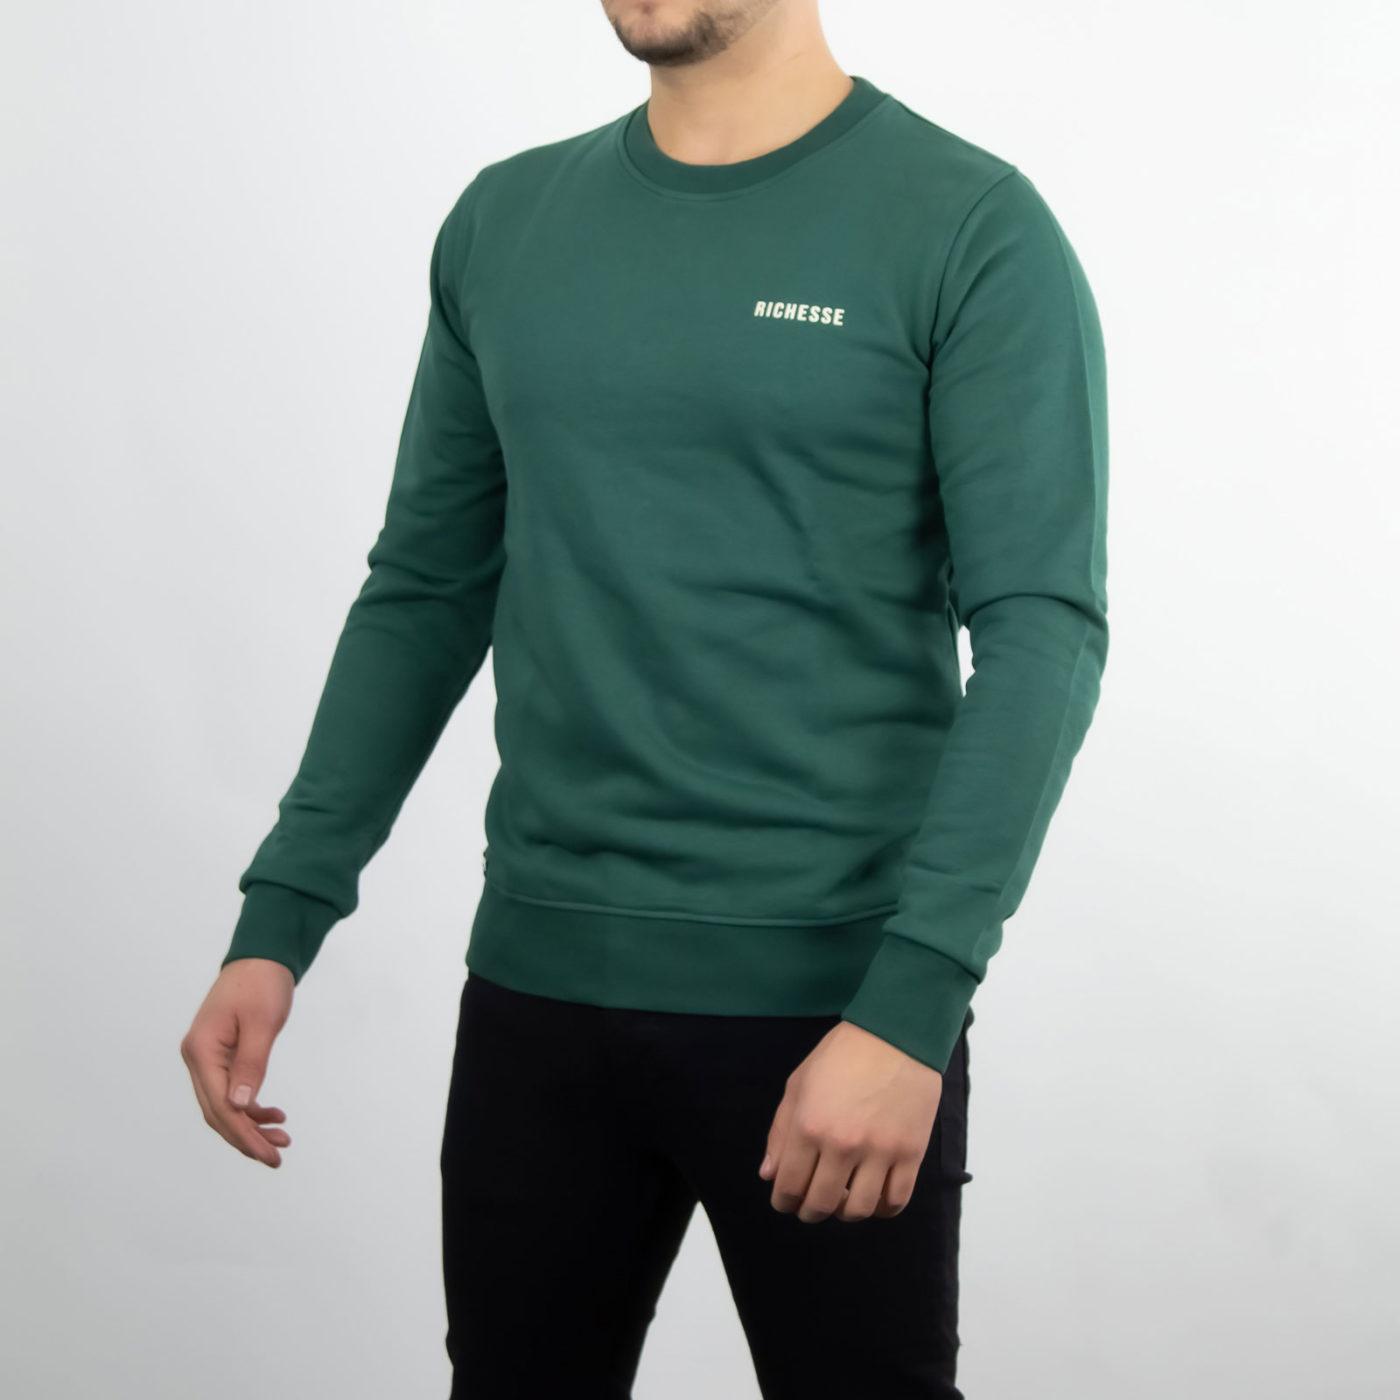 Richesse-Crewneck-Green-4